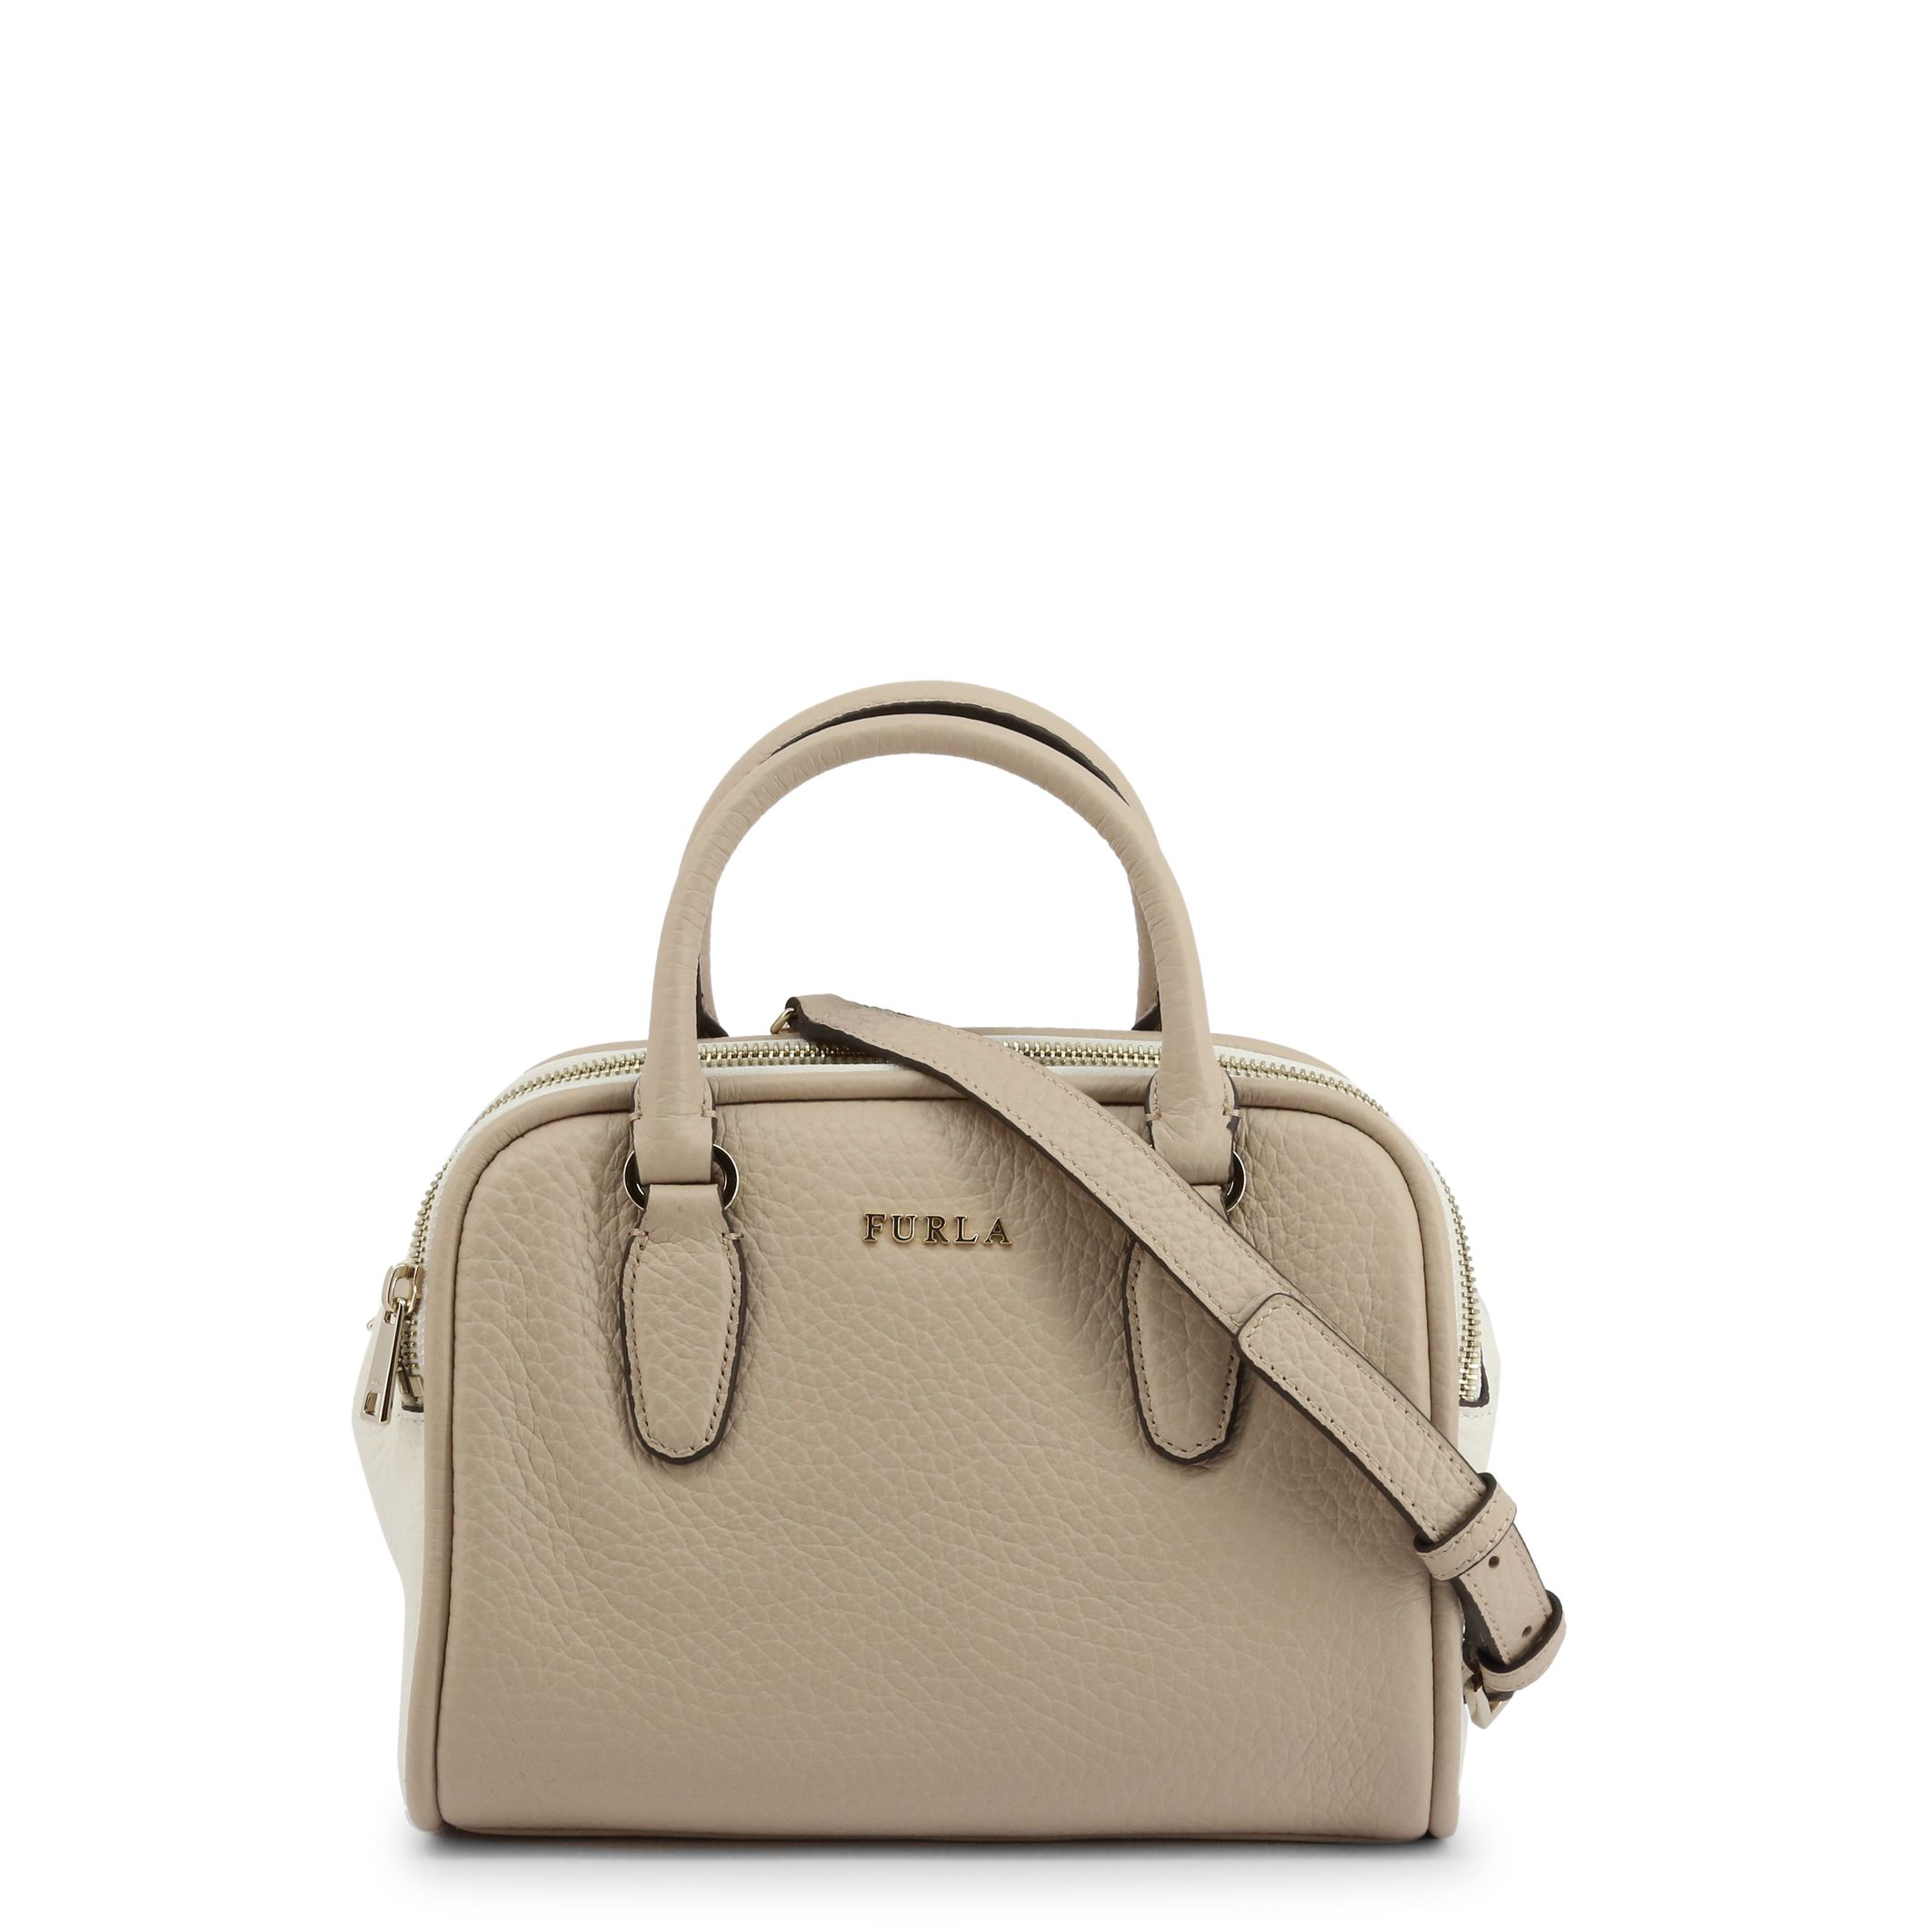 Furla Womens Handbags